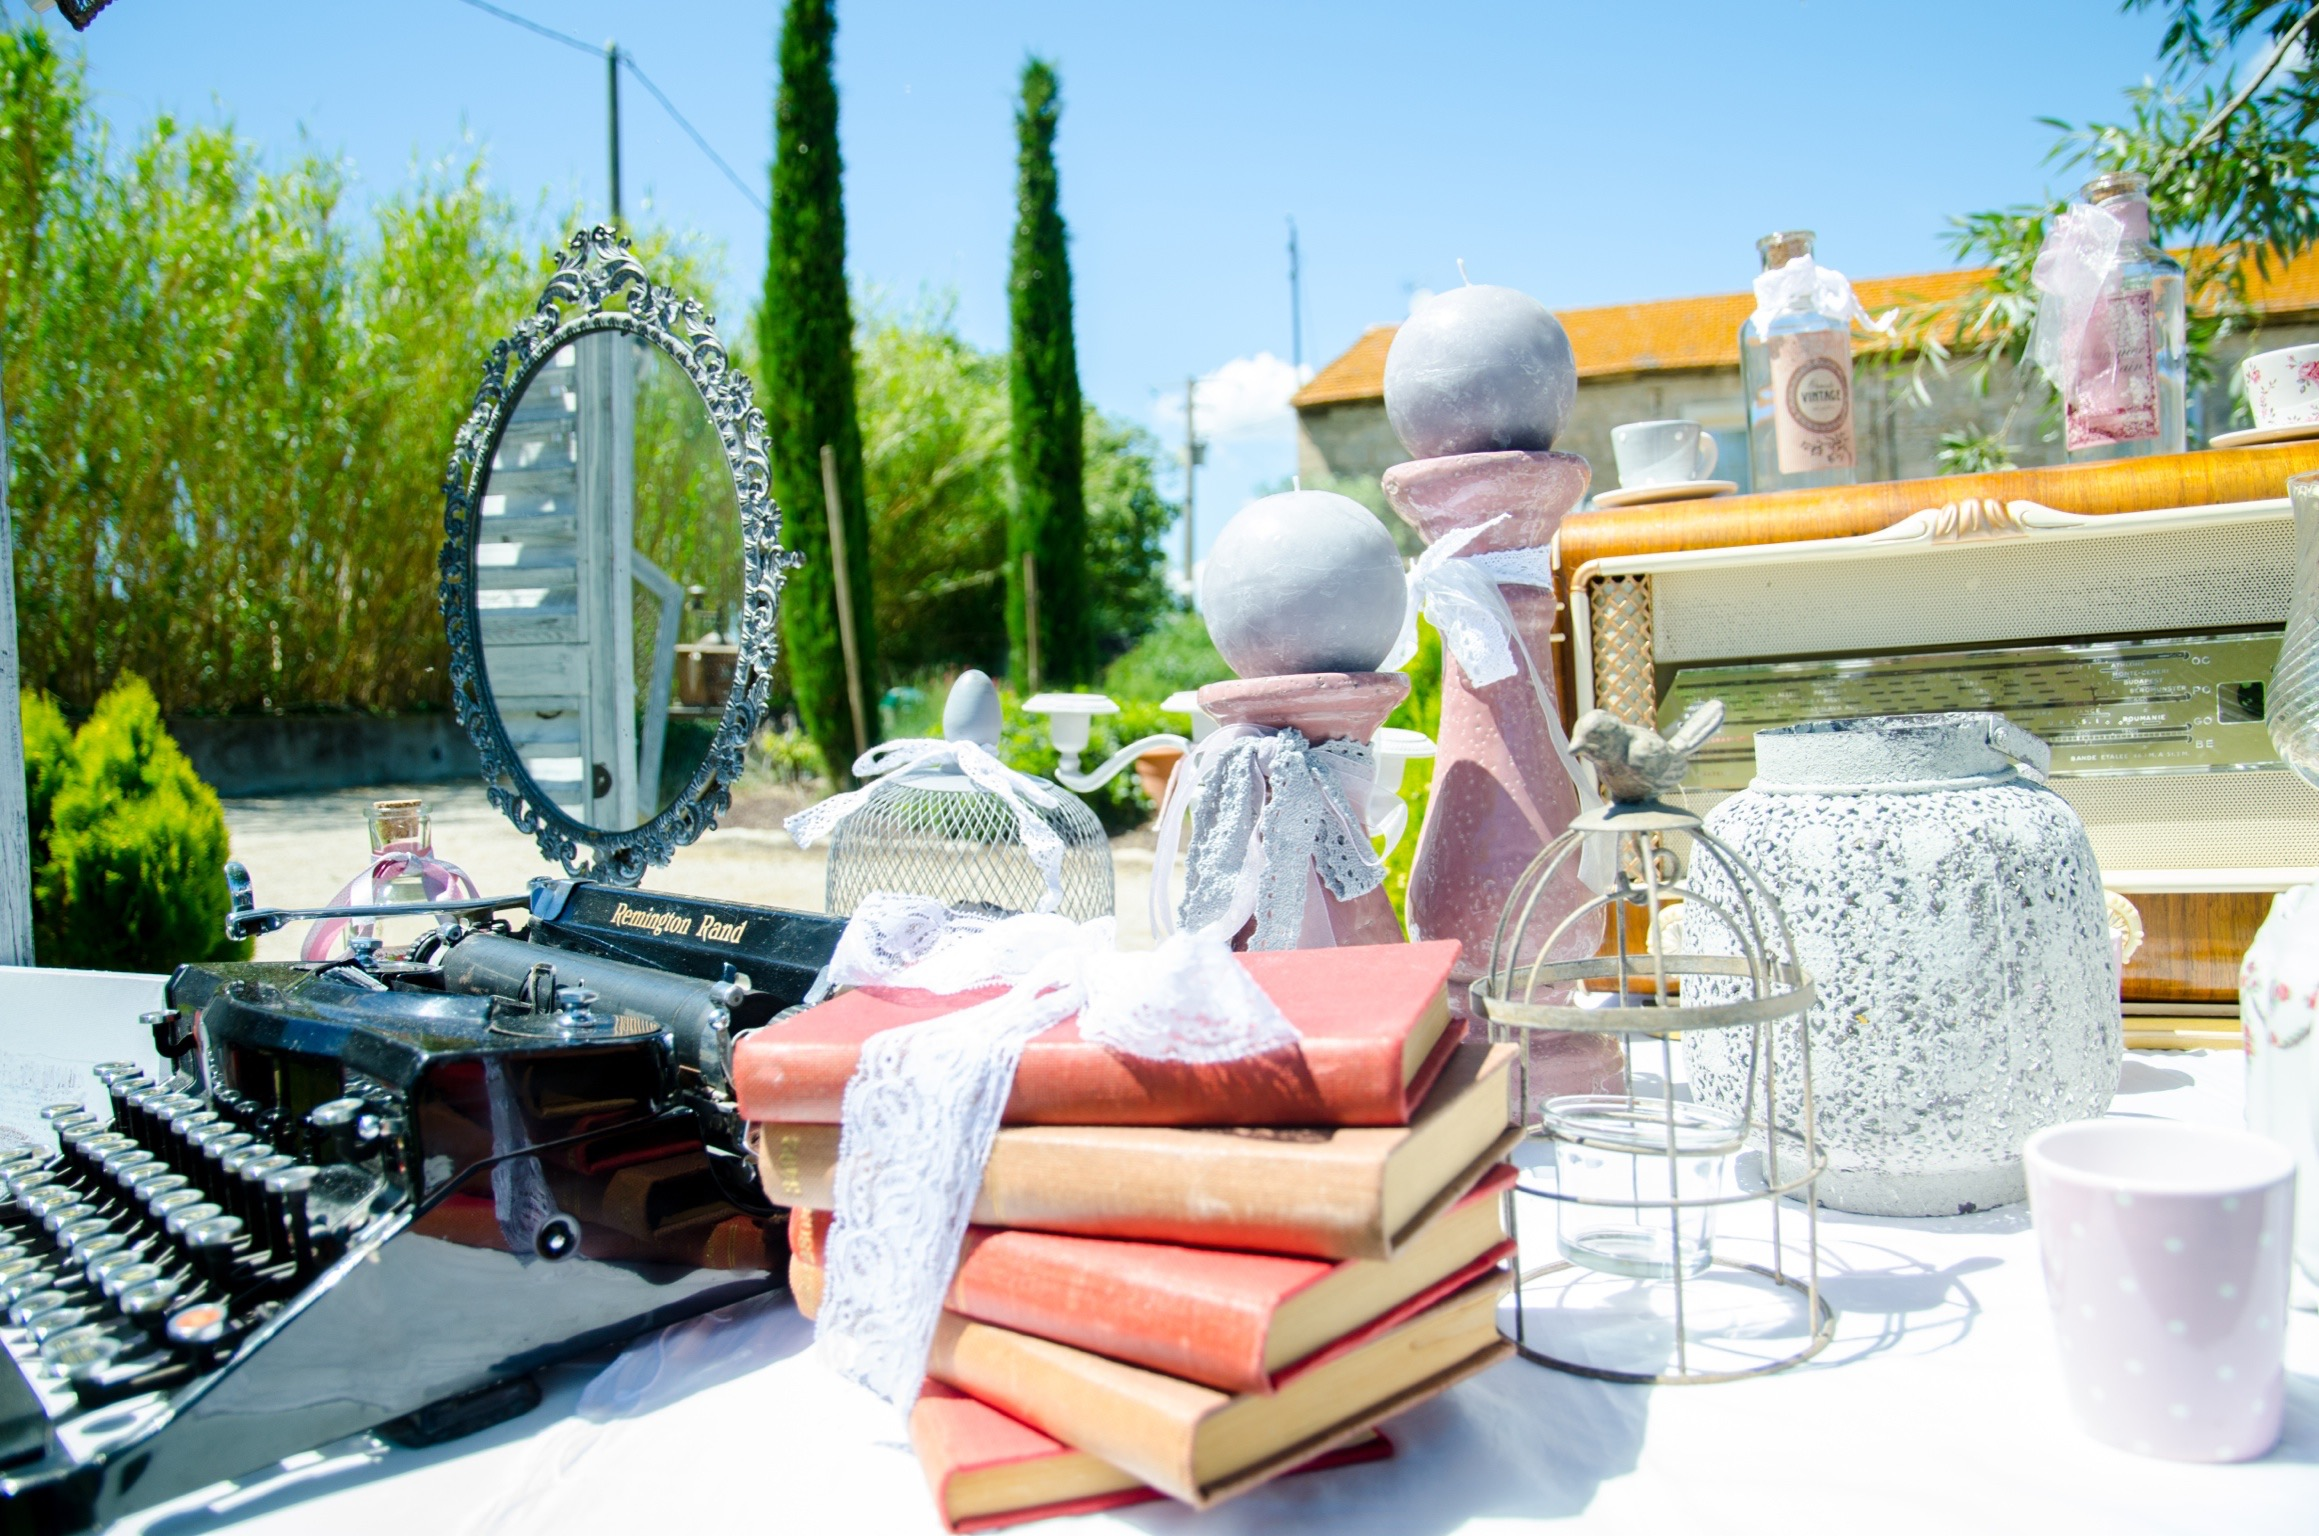 le coeur dans les etoiles - wedding planner - provence - luberon - alpilles - sardaigne - italie - organisation - mariage - deco retro - theme de mariage